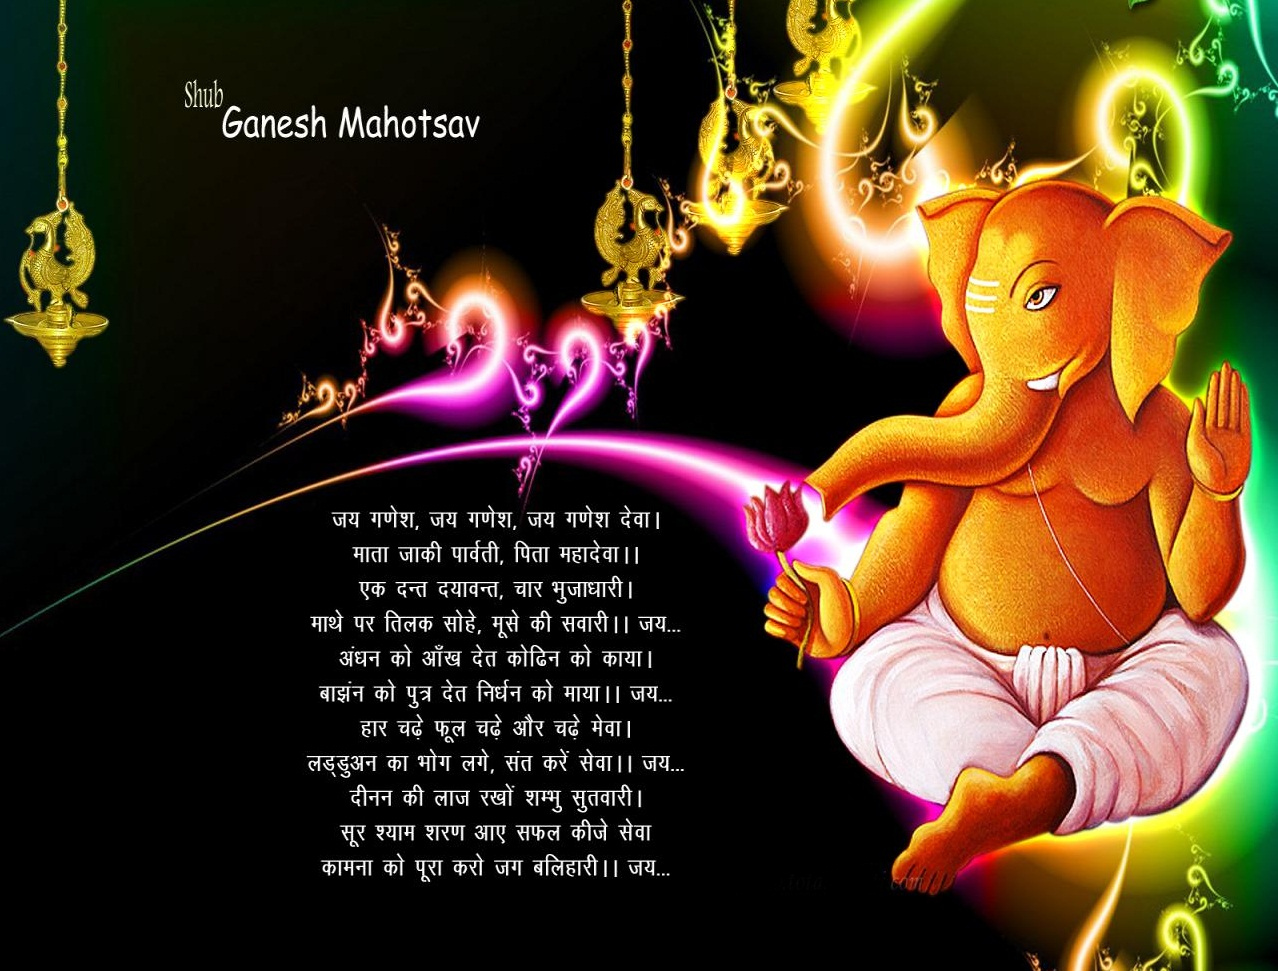 New ganesh chaturthi wishes sms in marathi english hindi new ganesh chaturthi wishes sms in marathi english hindi kristyandbryce Image collections